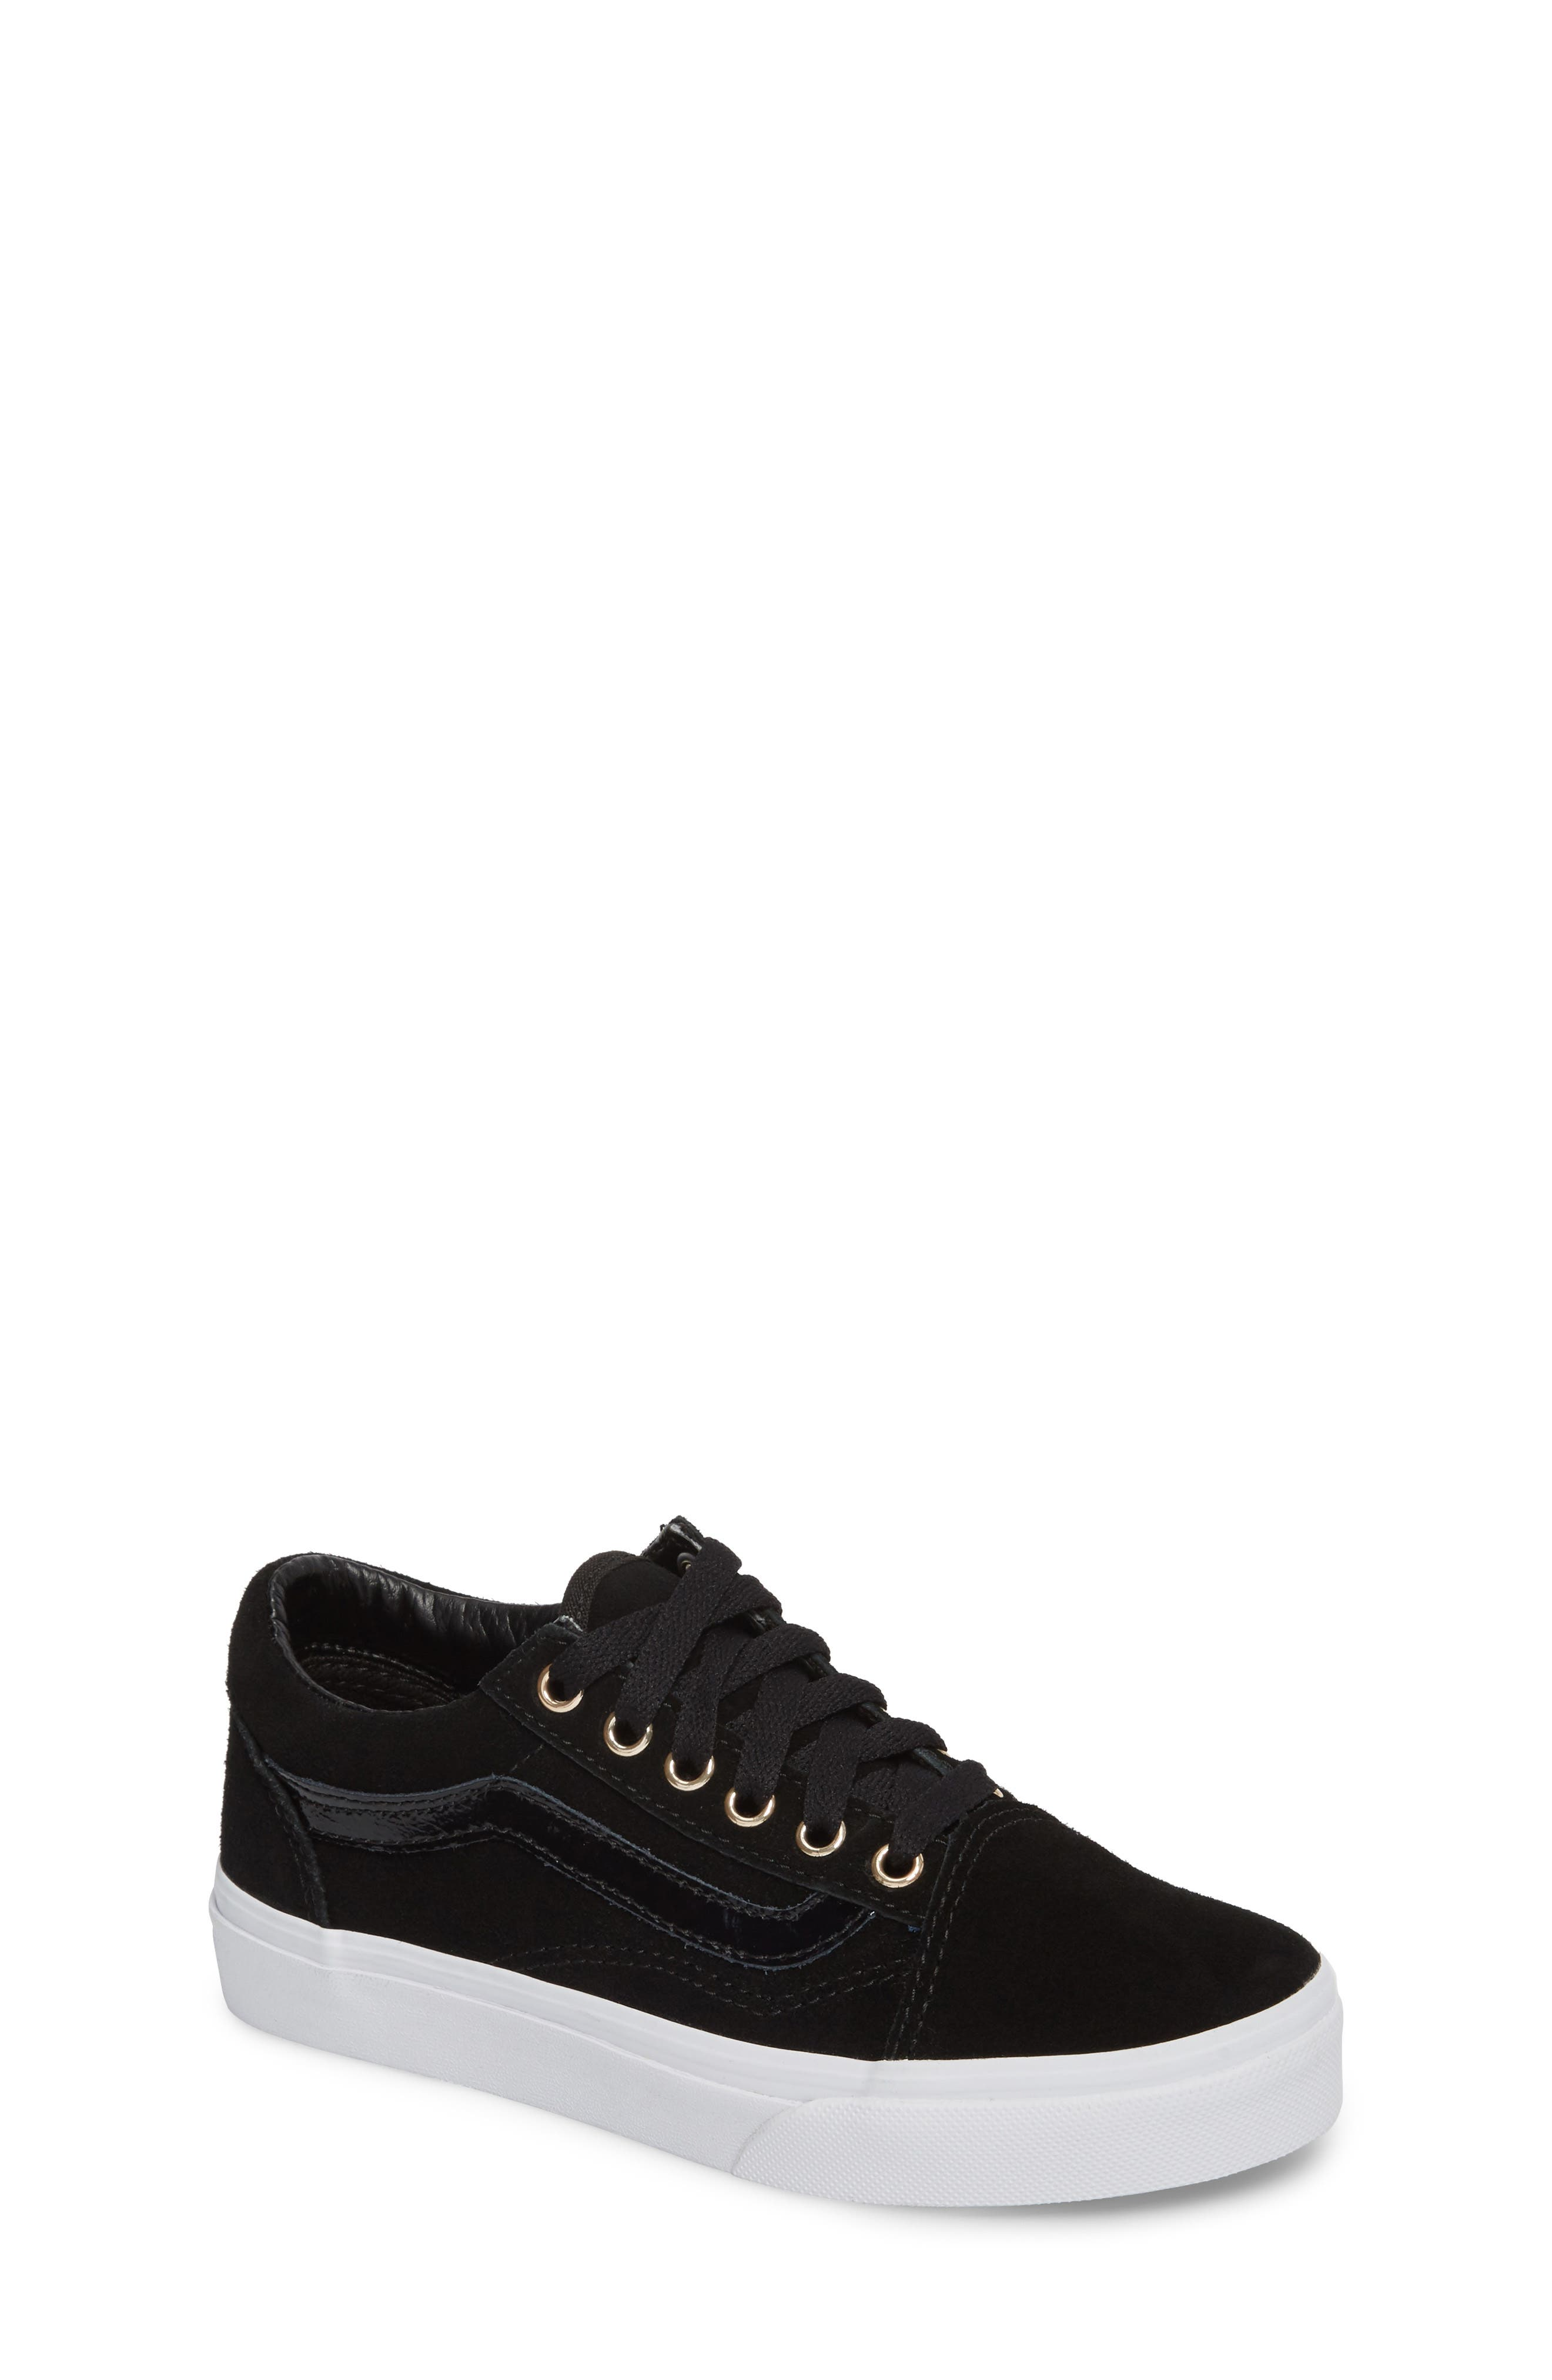 Old Skool Sneaker,                             Main thumbnail 1, color,                             Black/ Gold